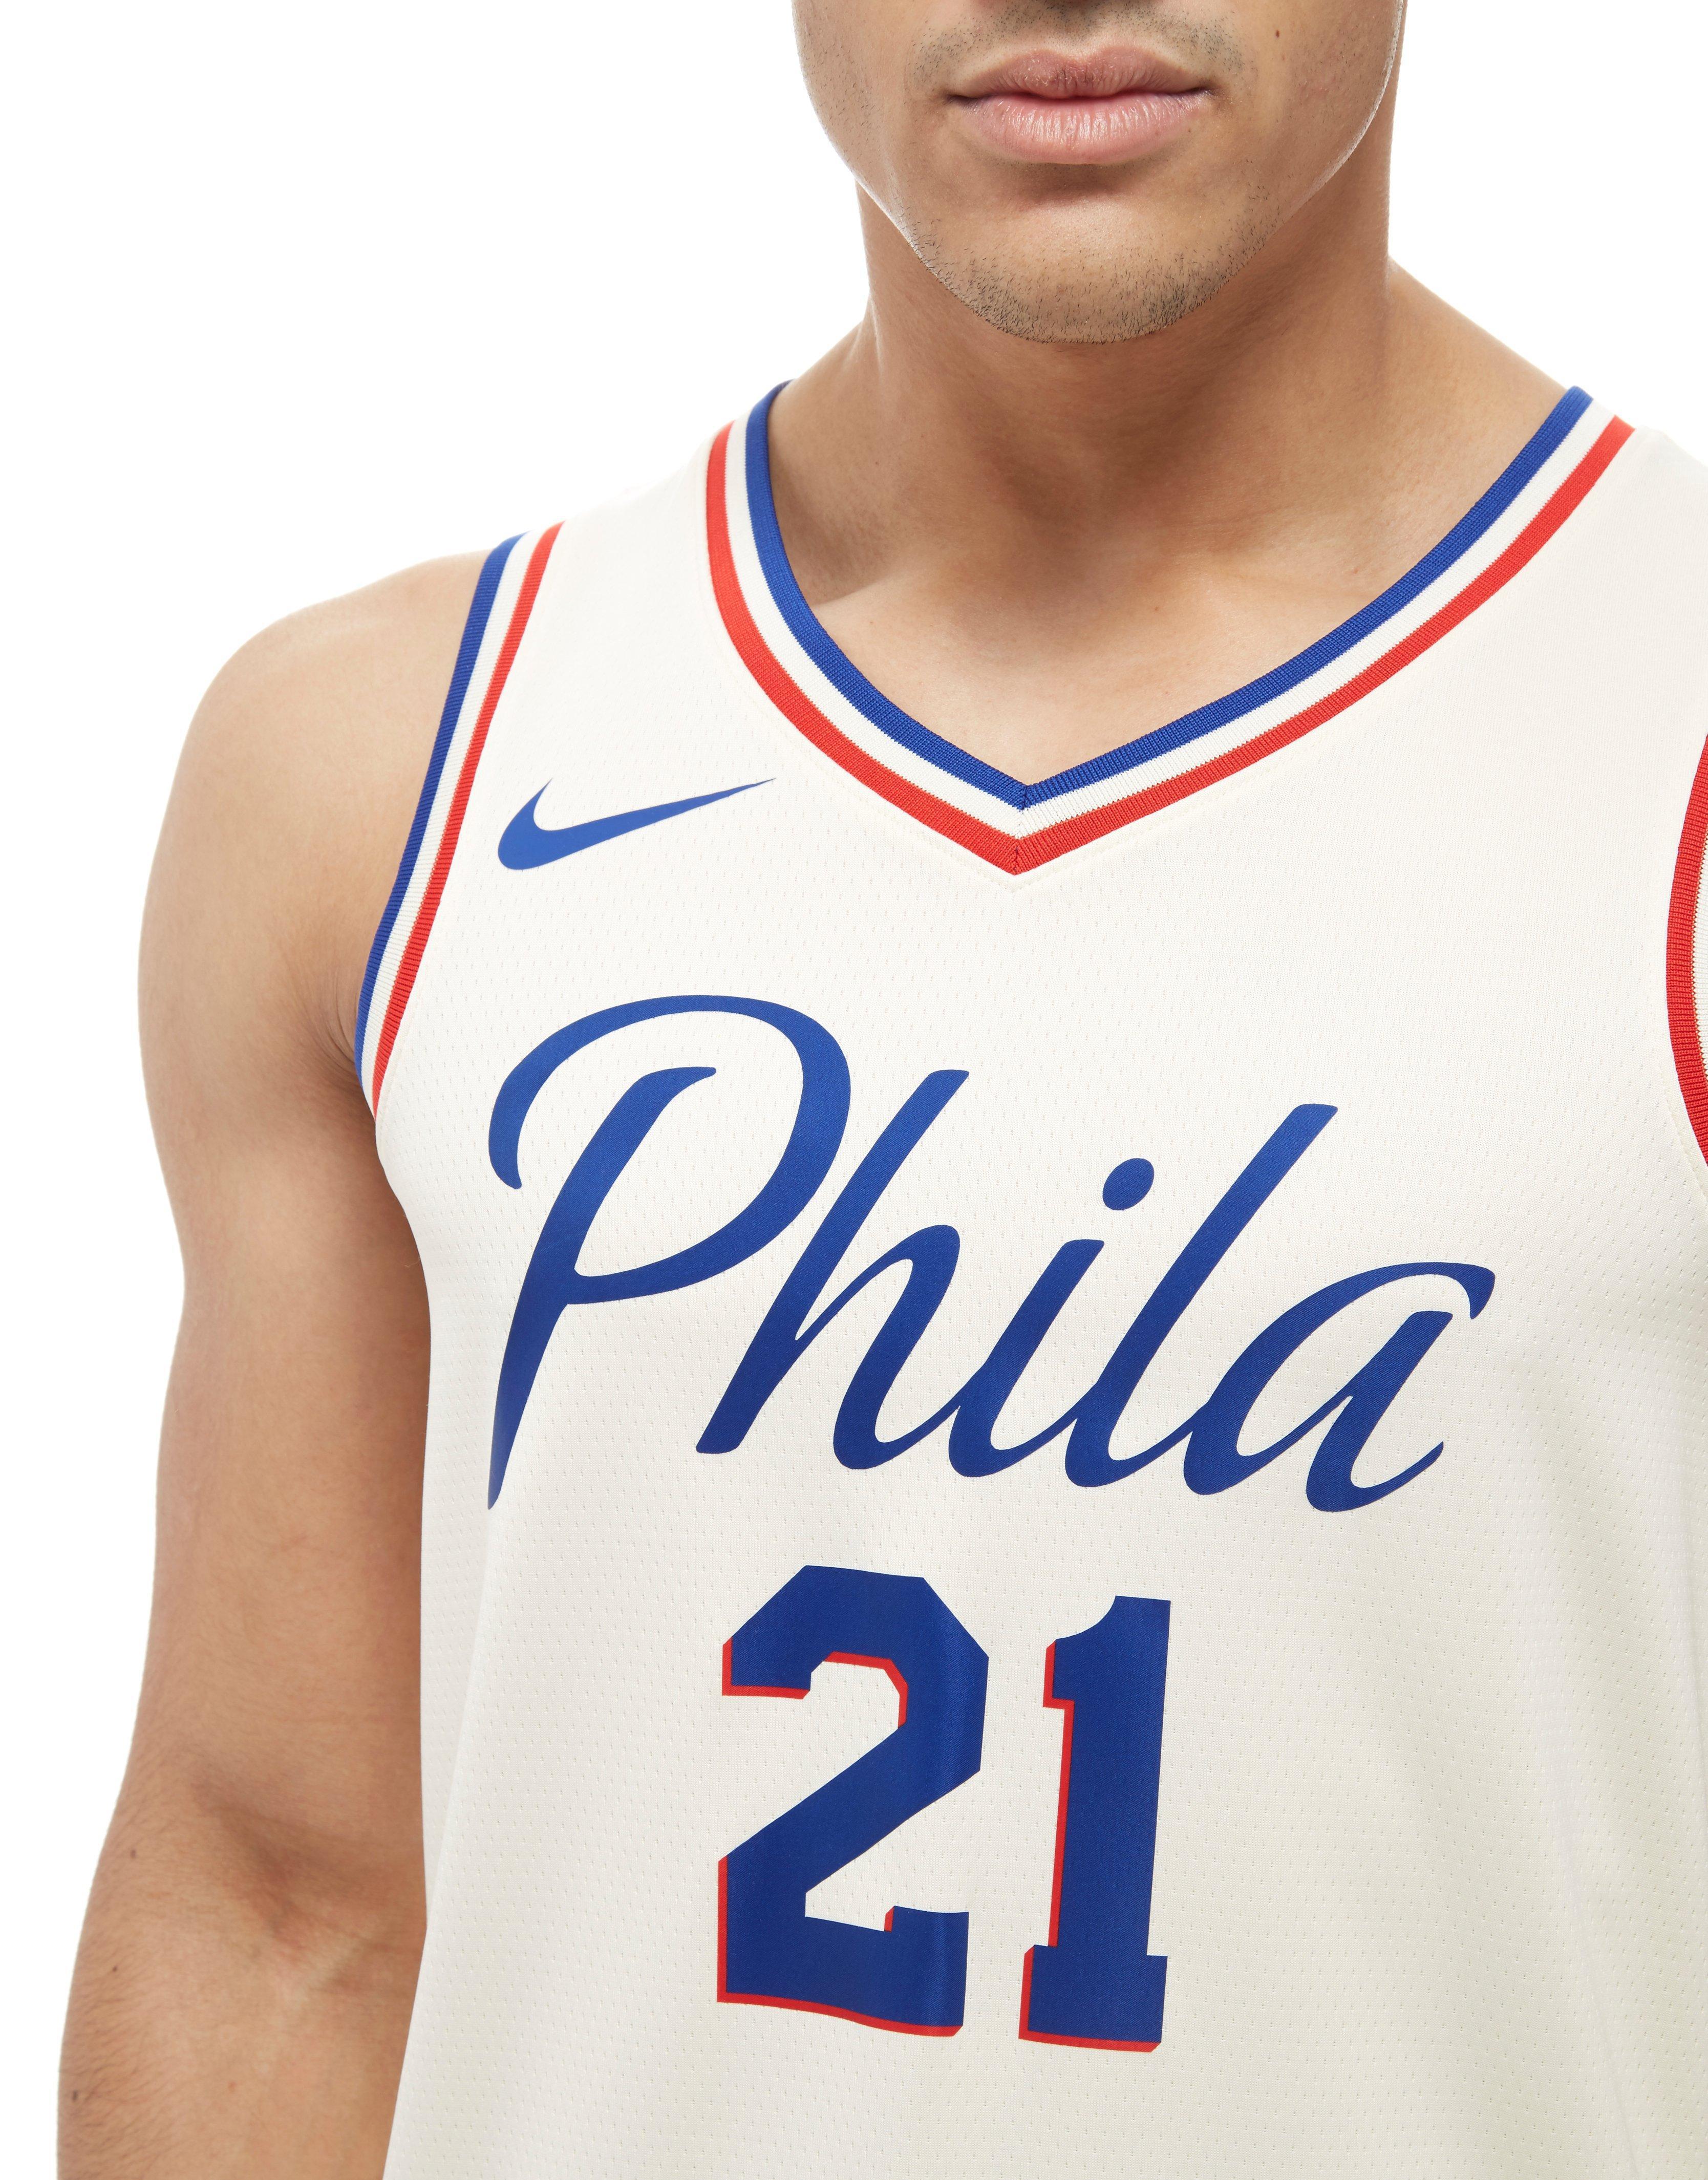 timeless design df05a 0336a Nike White Nba Embiid Philadelphia 76ers City Jersey for men